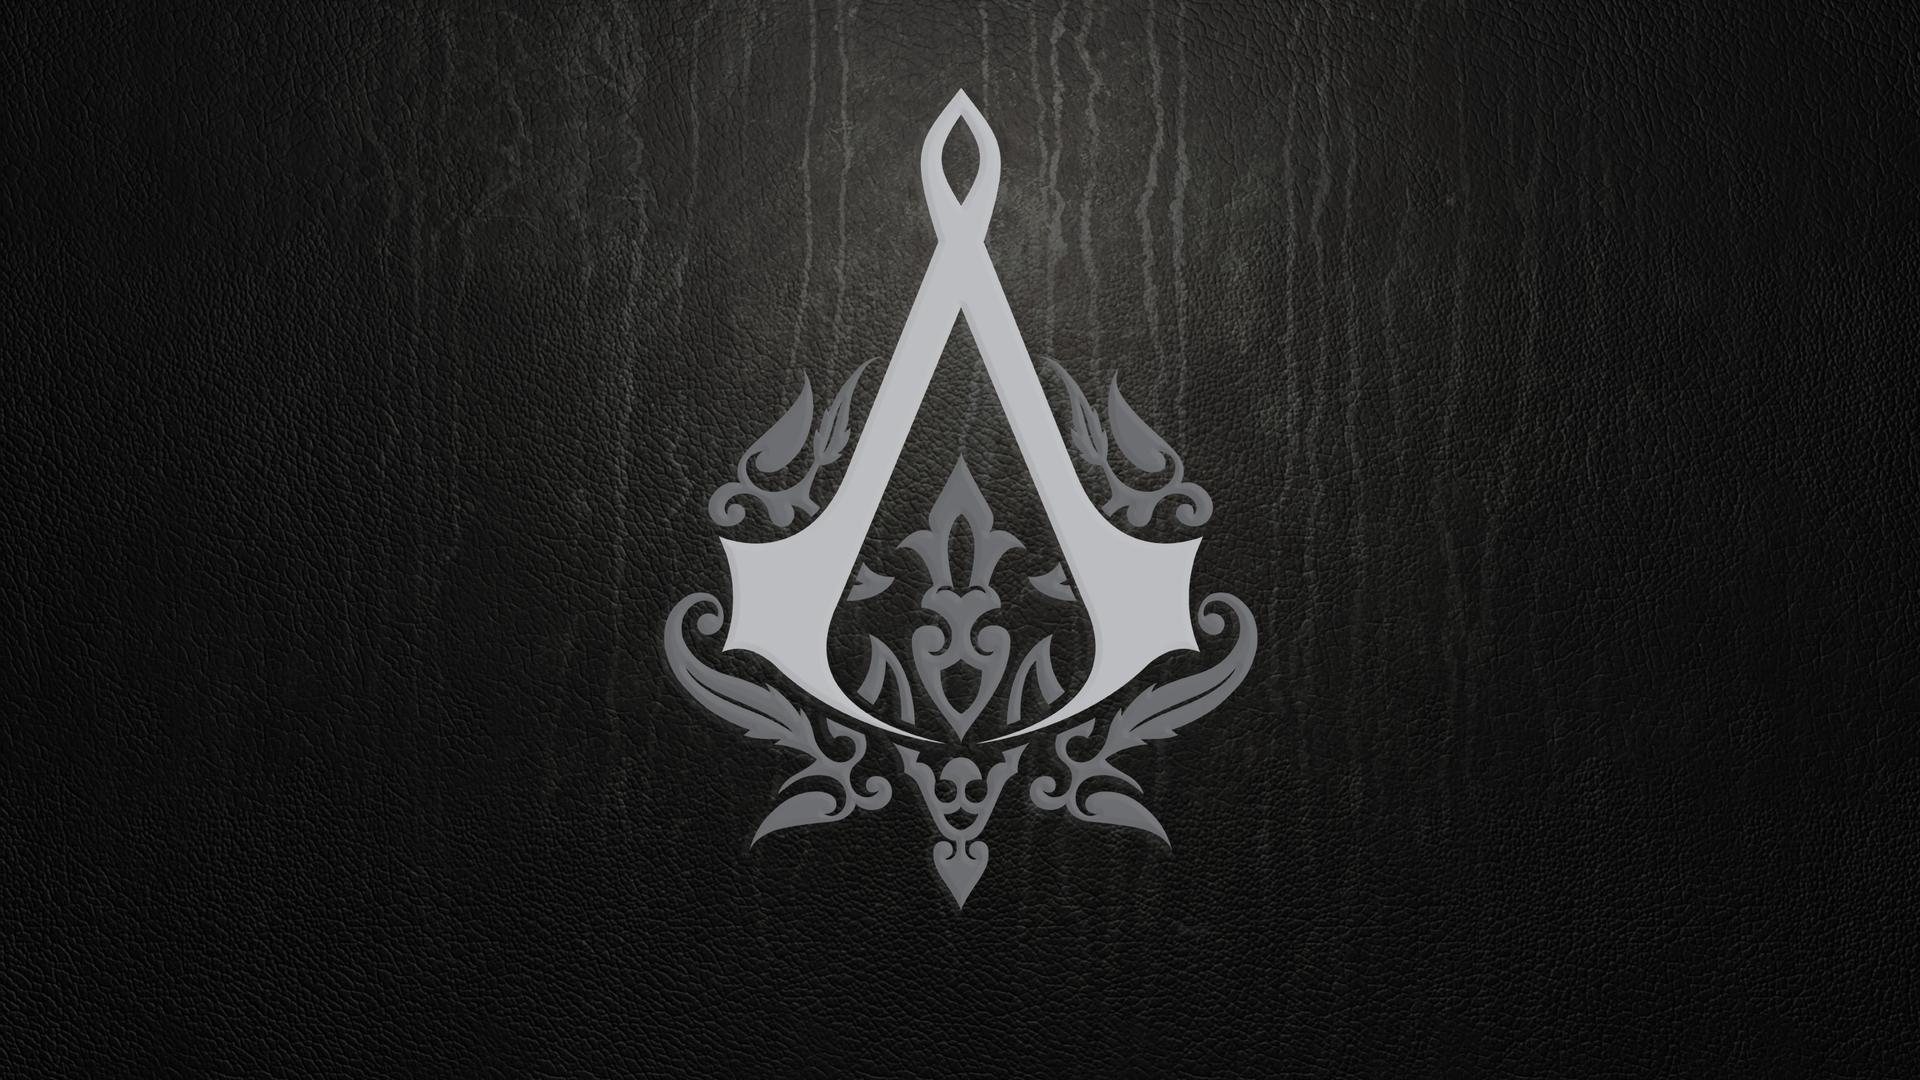 Assassins Creed Logo W 1920x1080